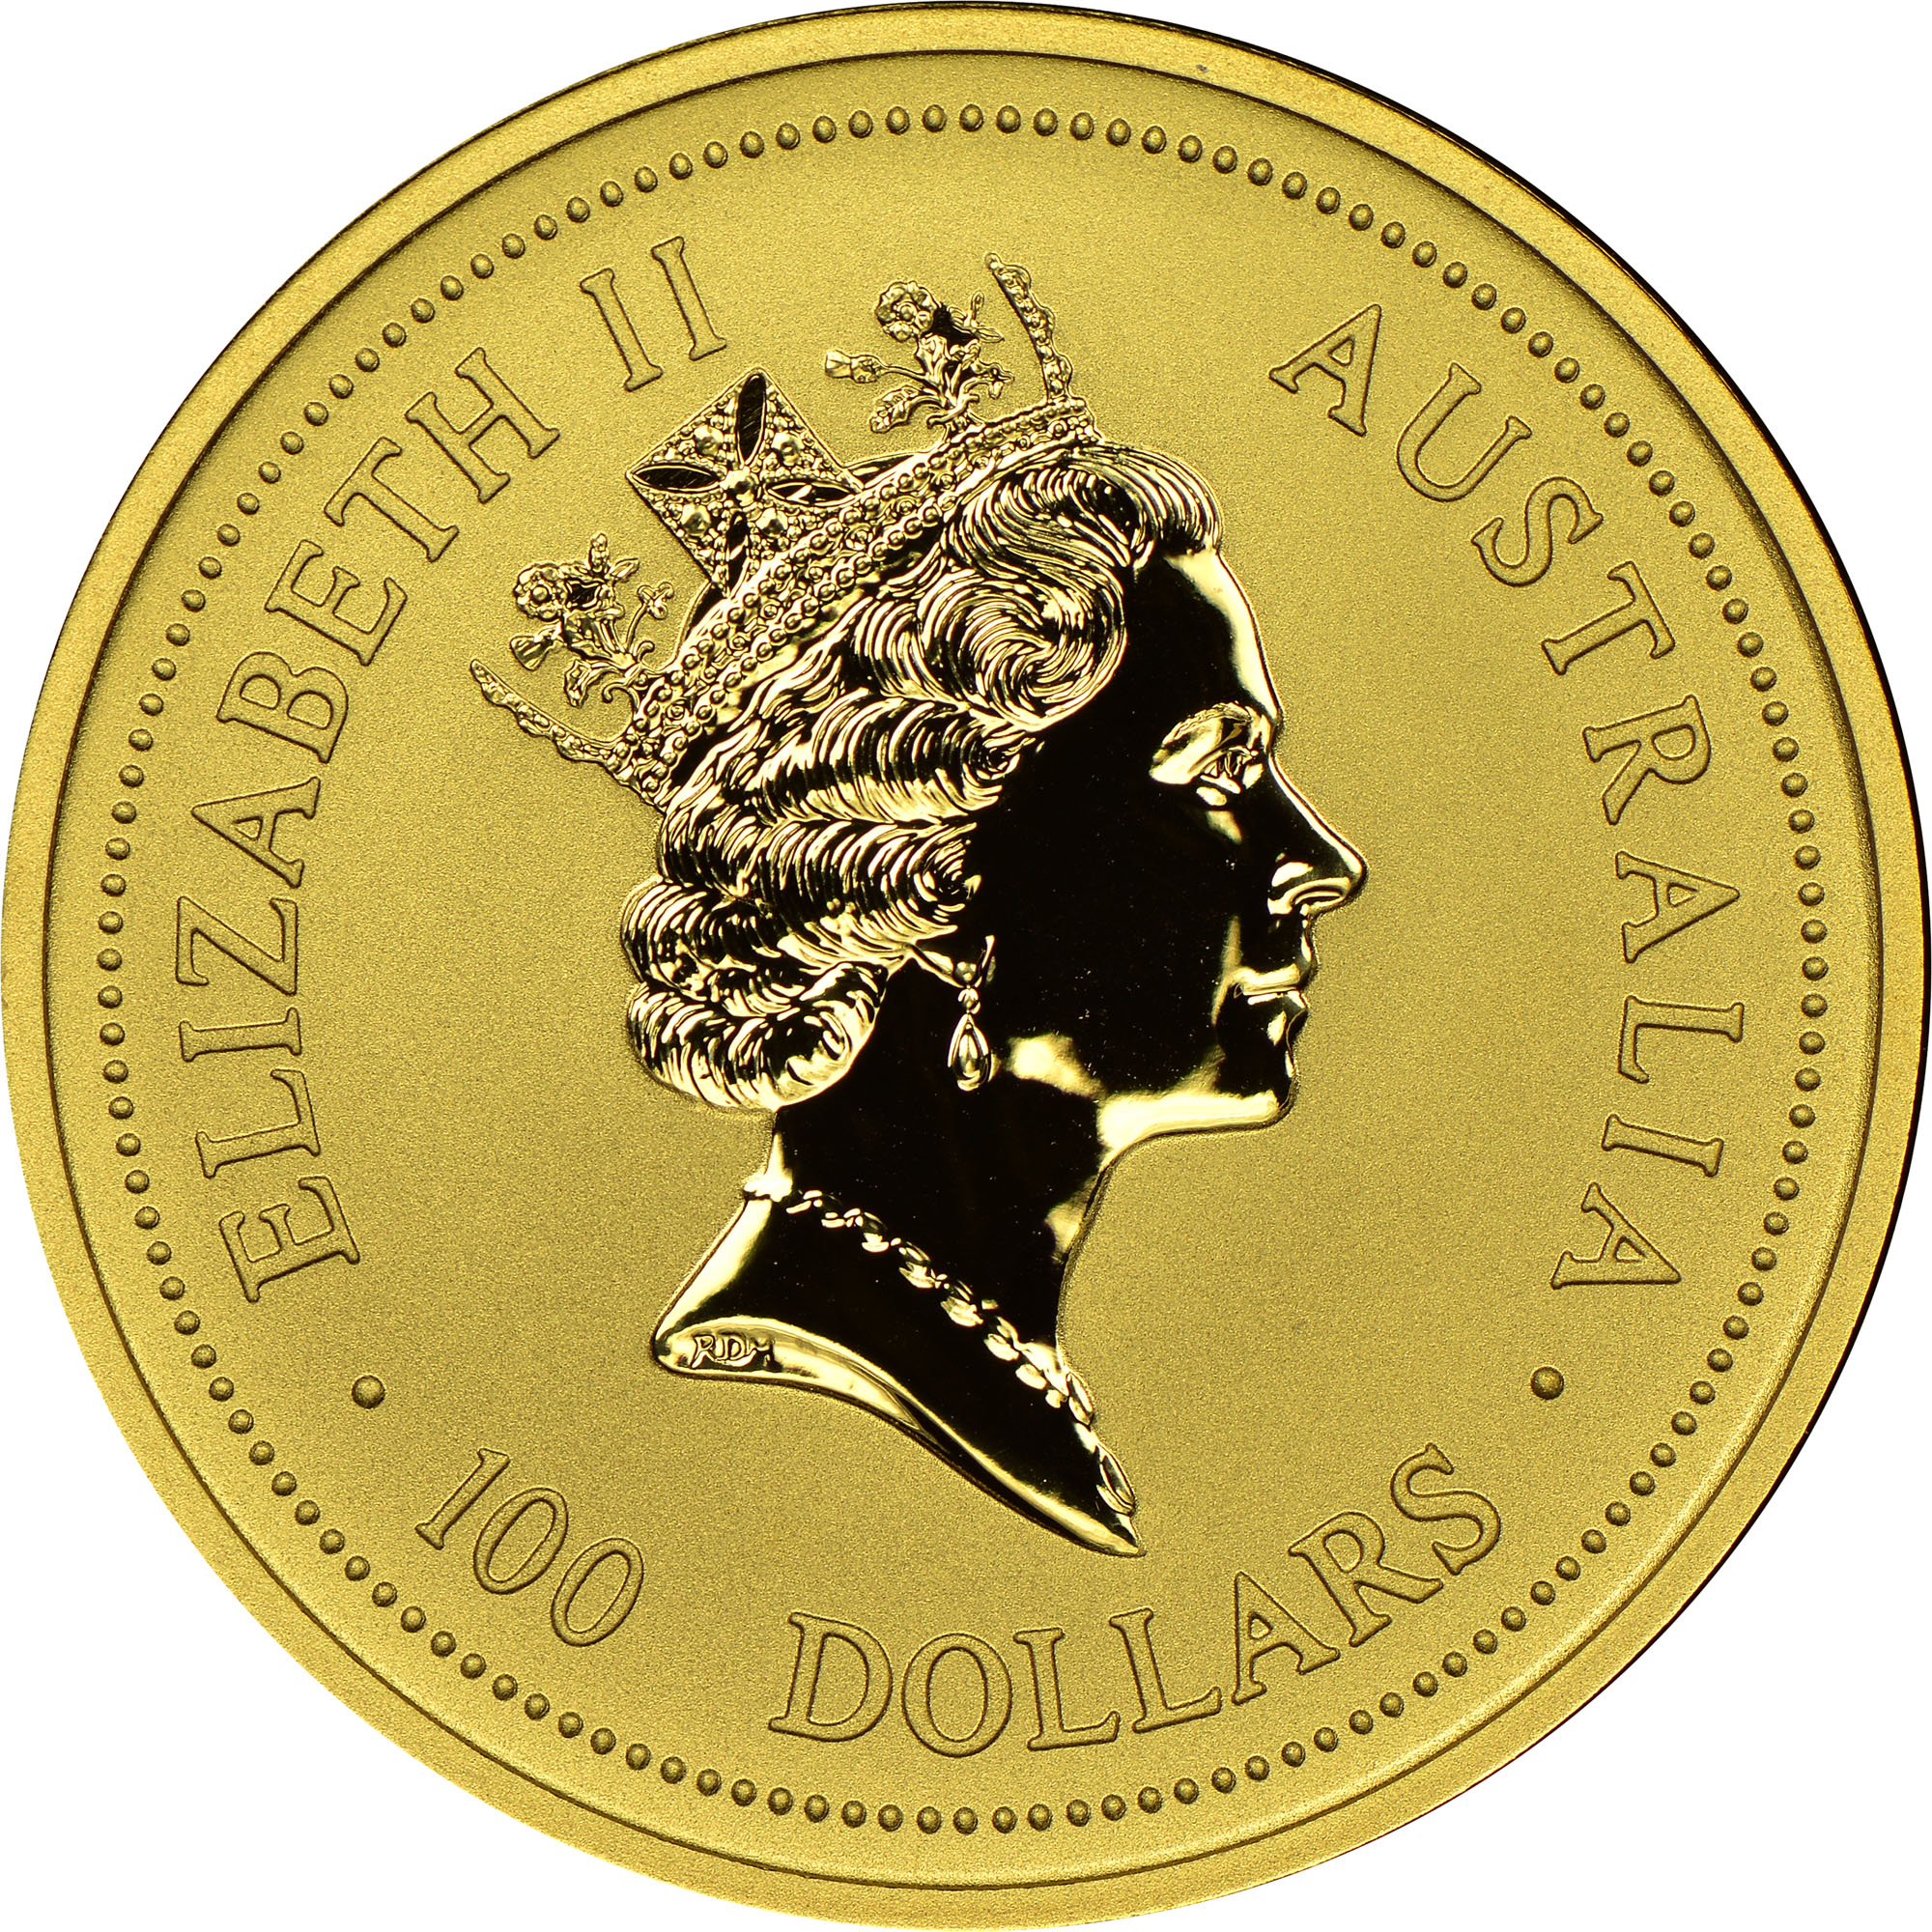 1998 Australia 100 Dollars obverse